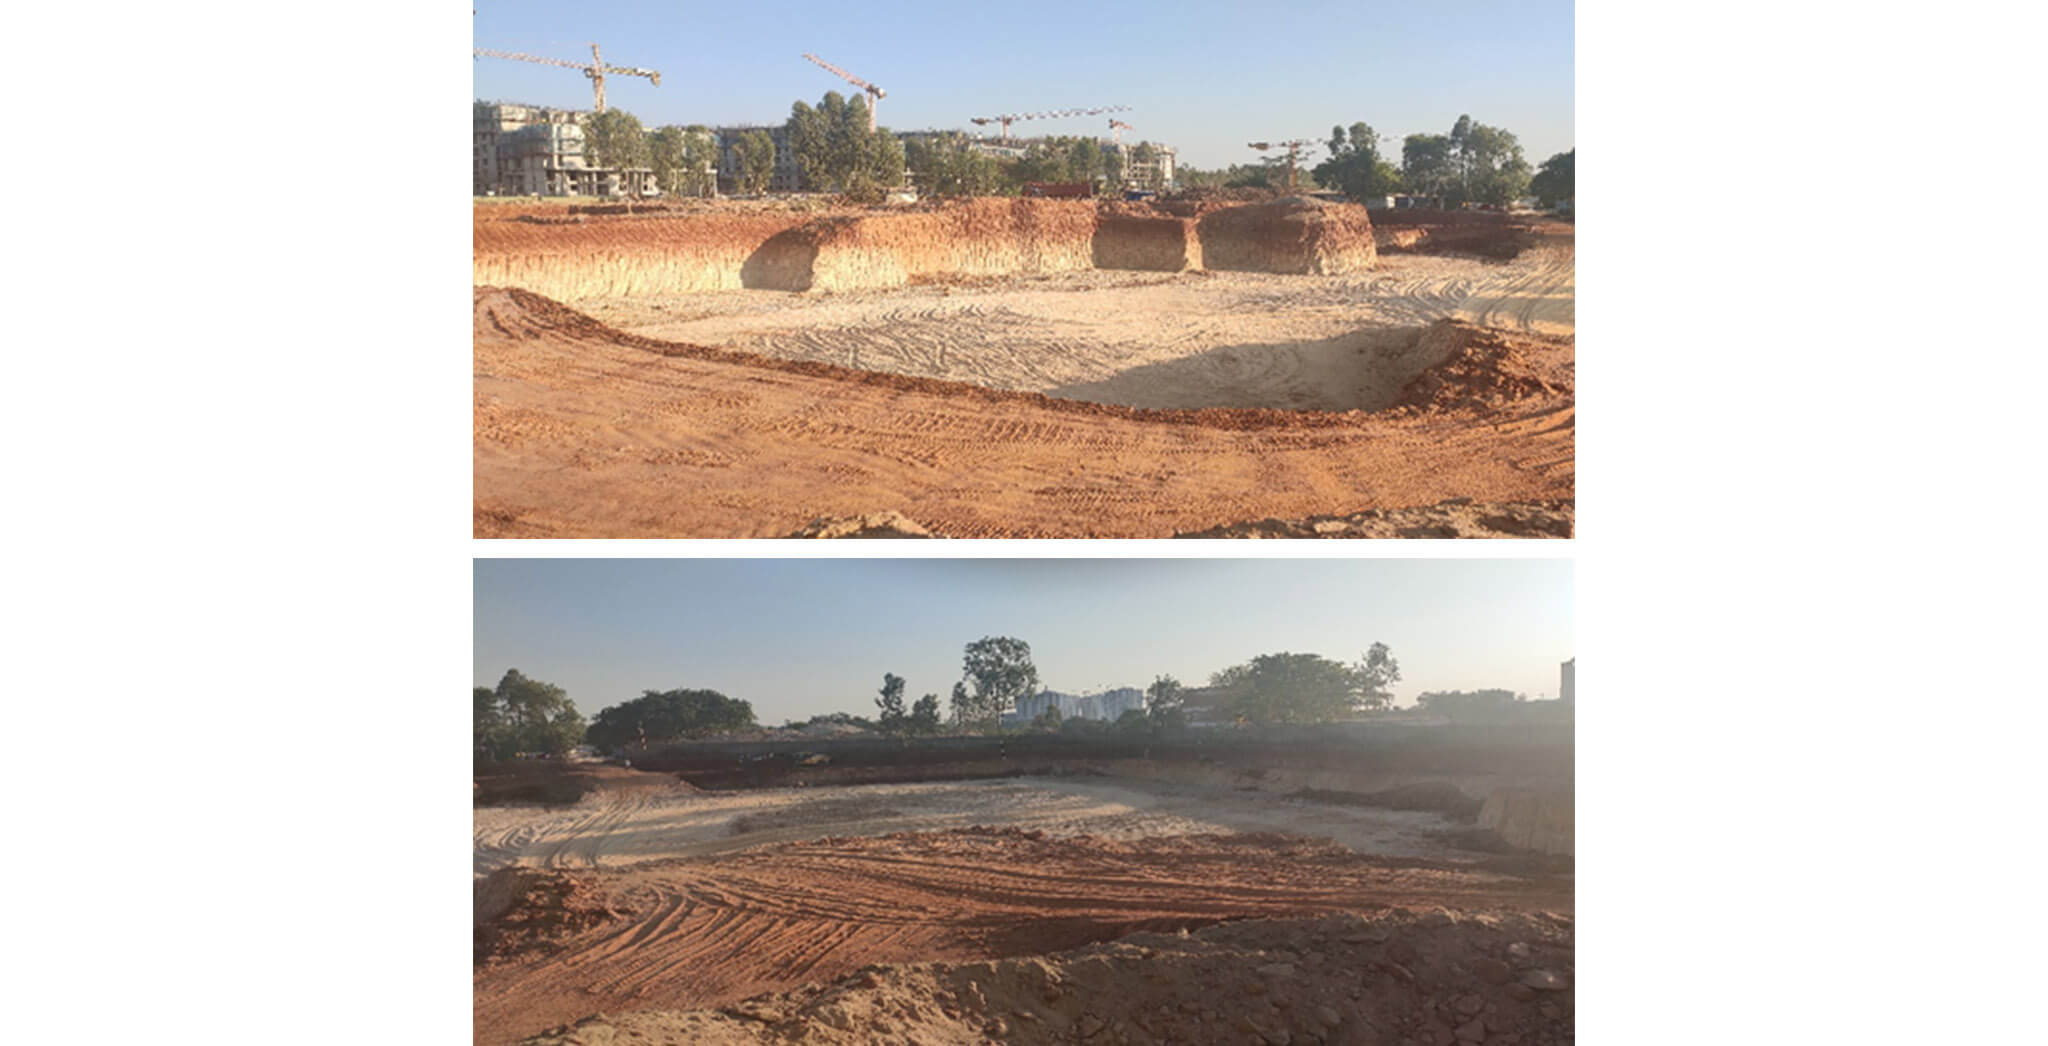 Mar 2020 - Tranquil: Excavation in progress